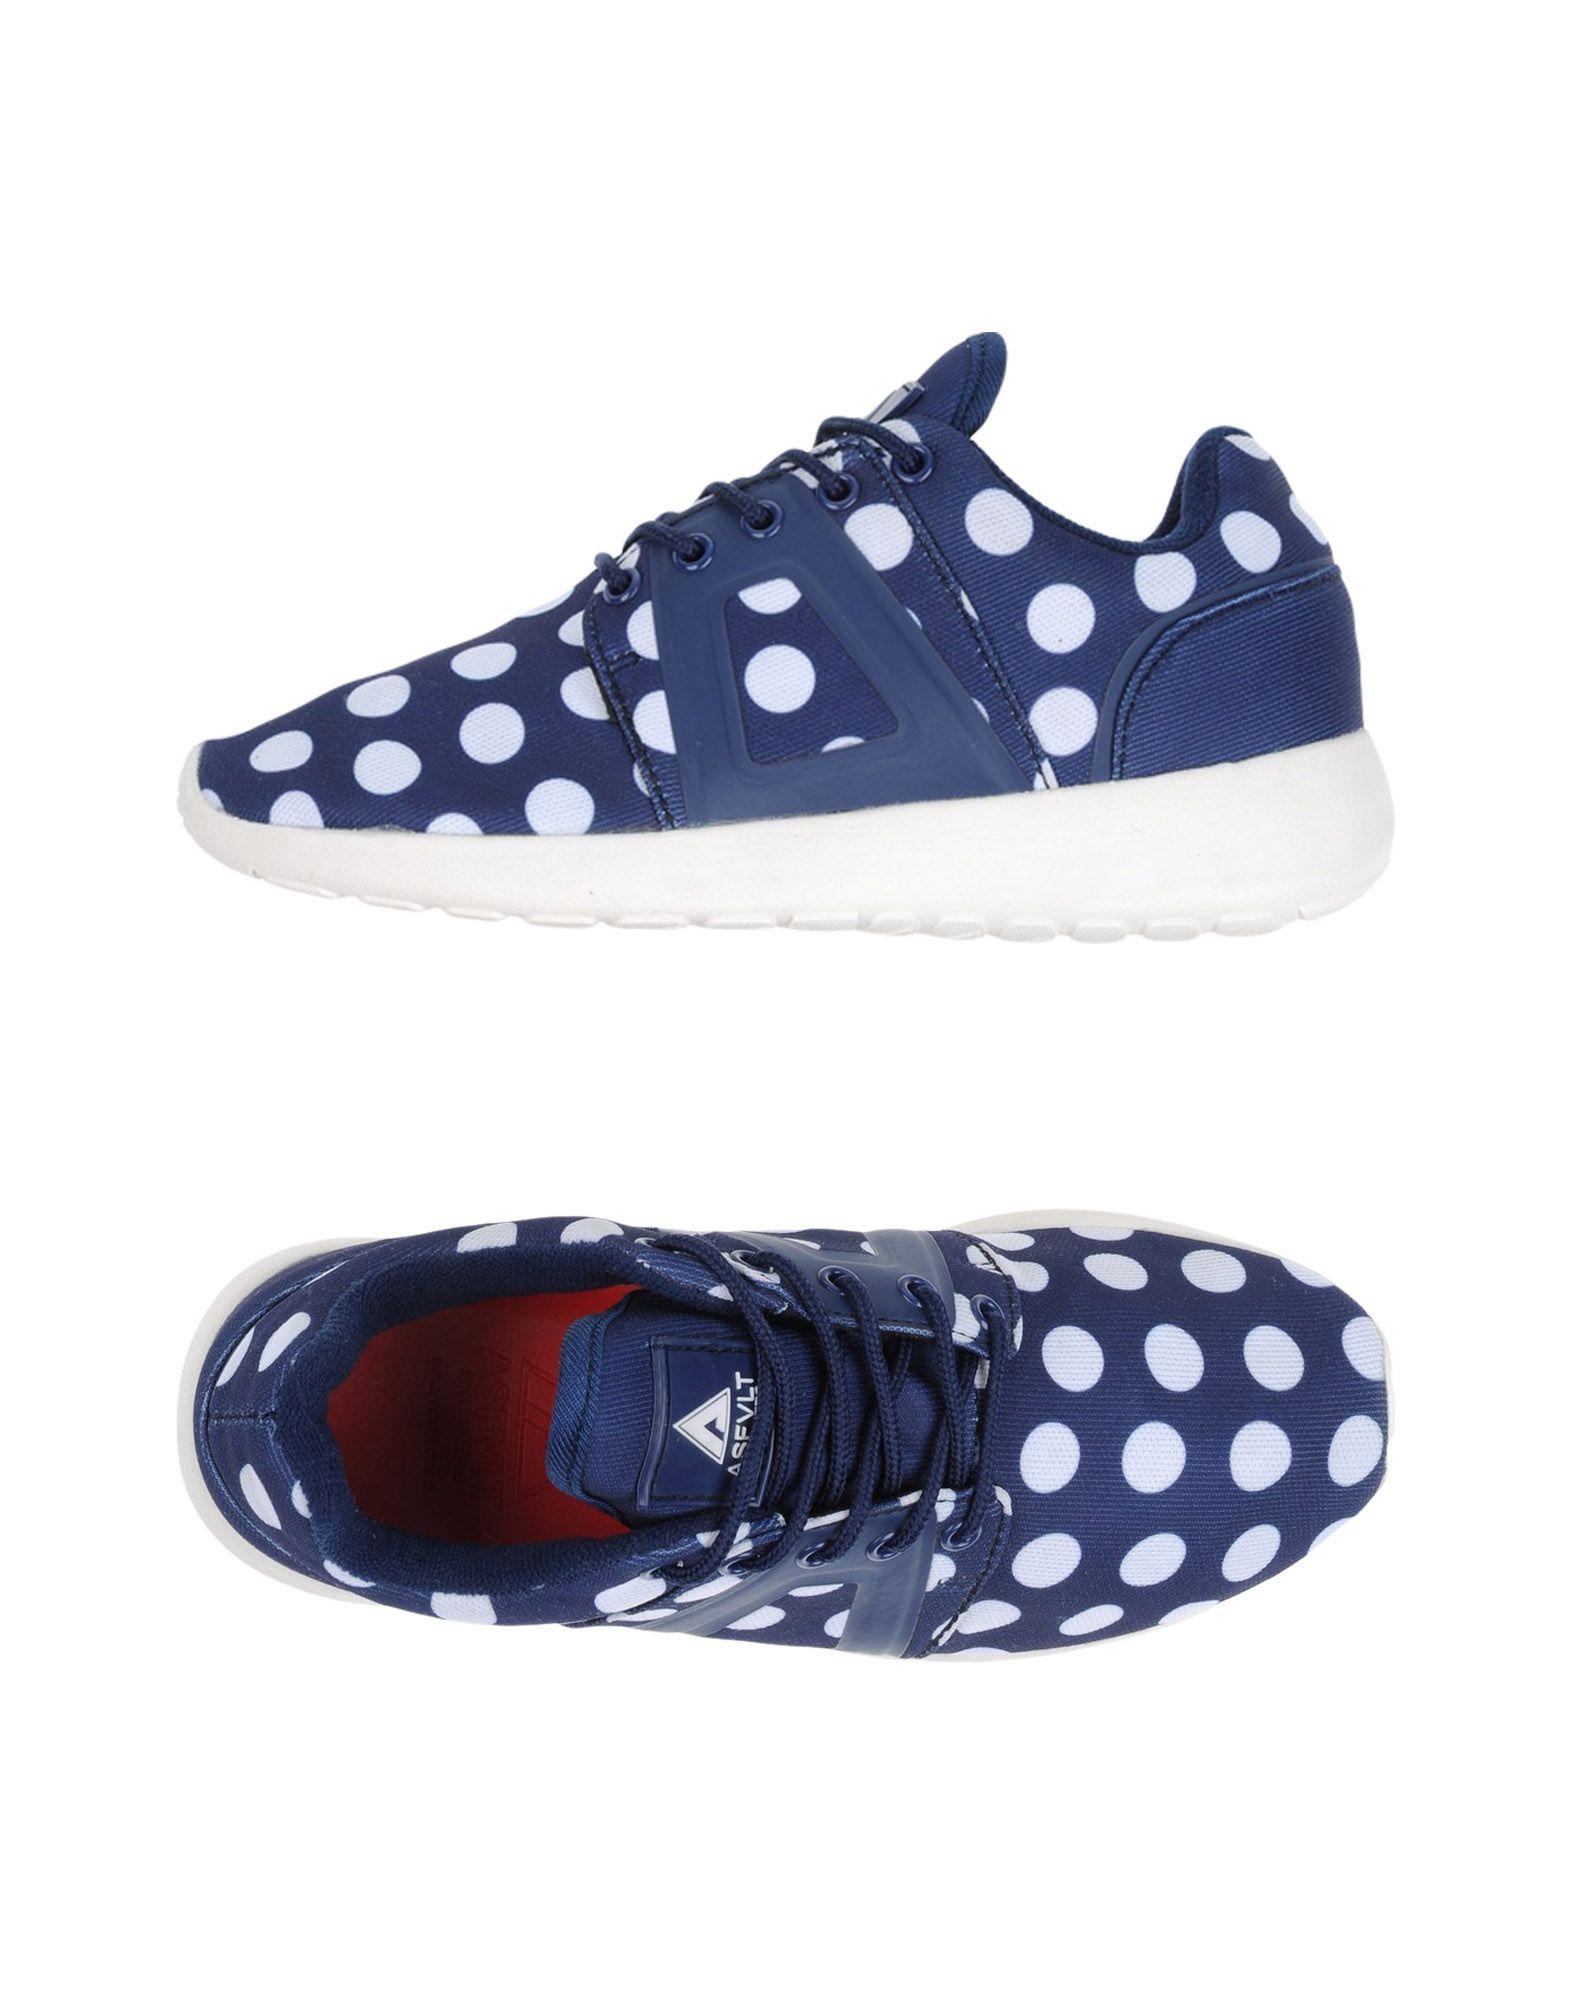 Günstige und modische Schuhe Asfvlt Sneakers Damen  11258609JT